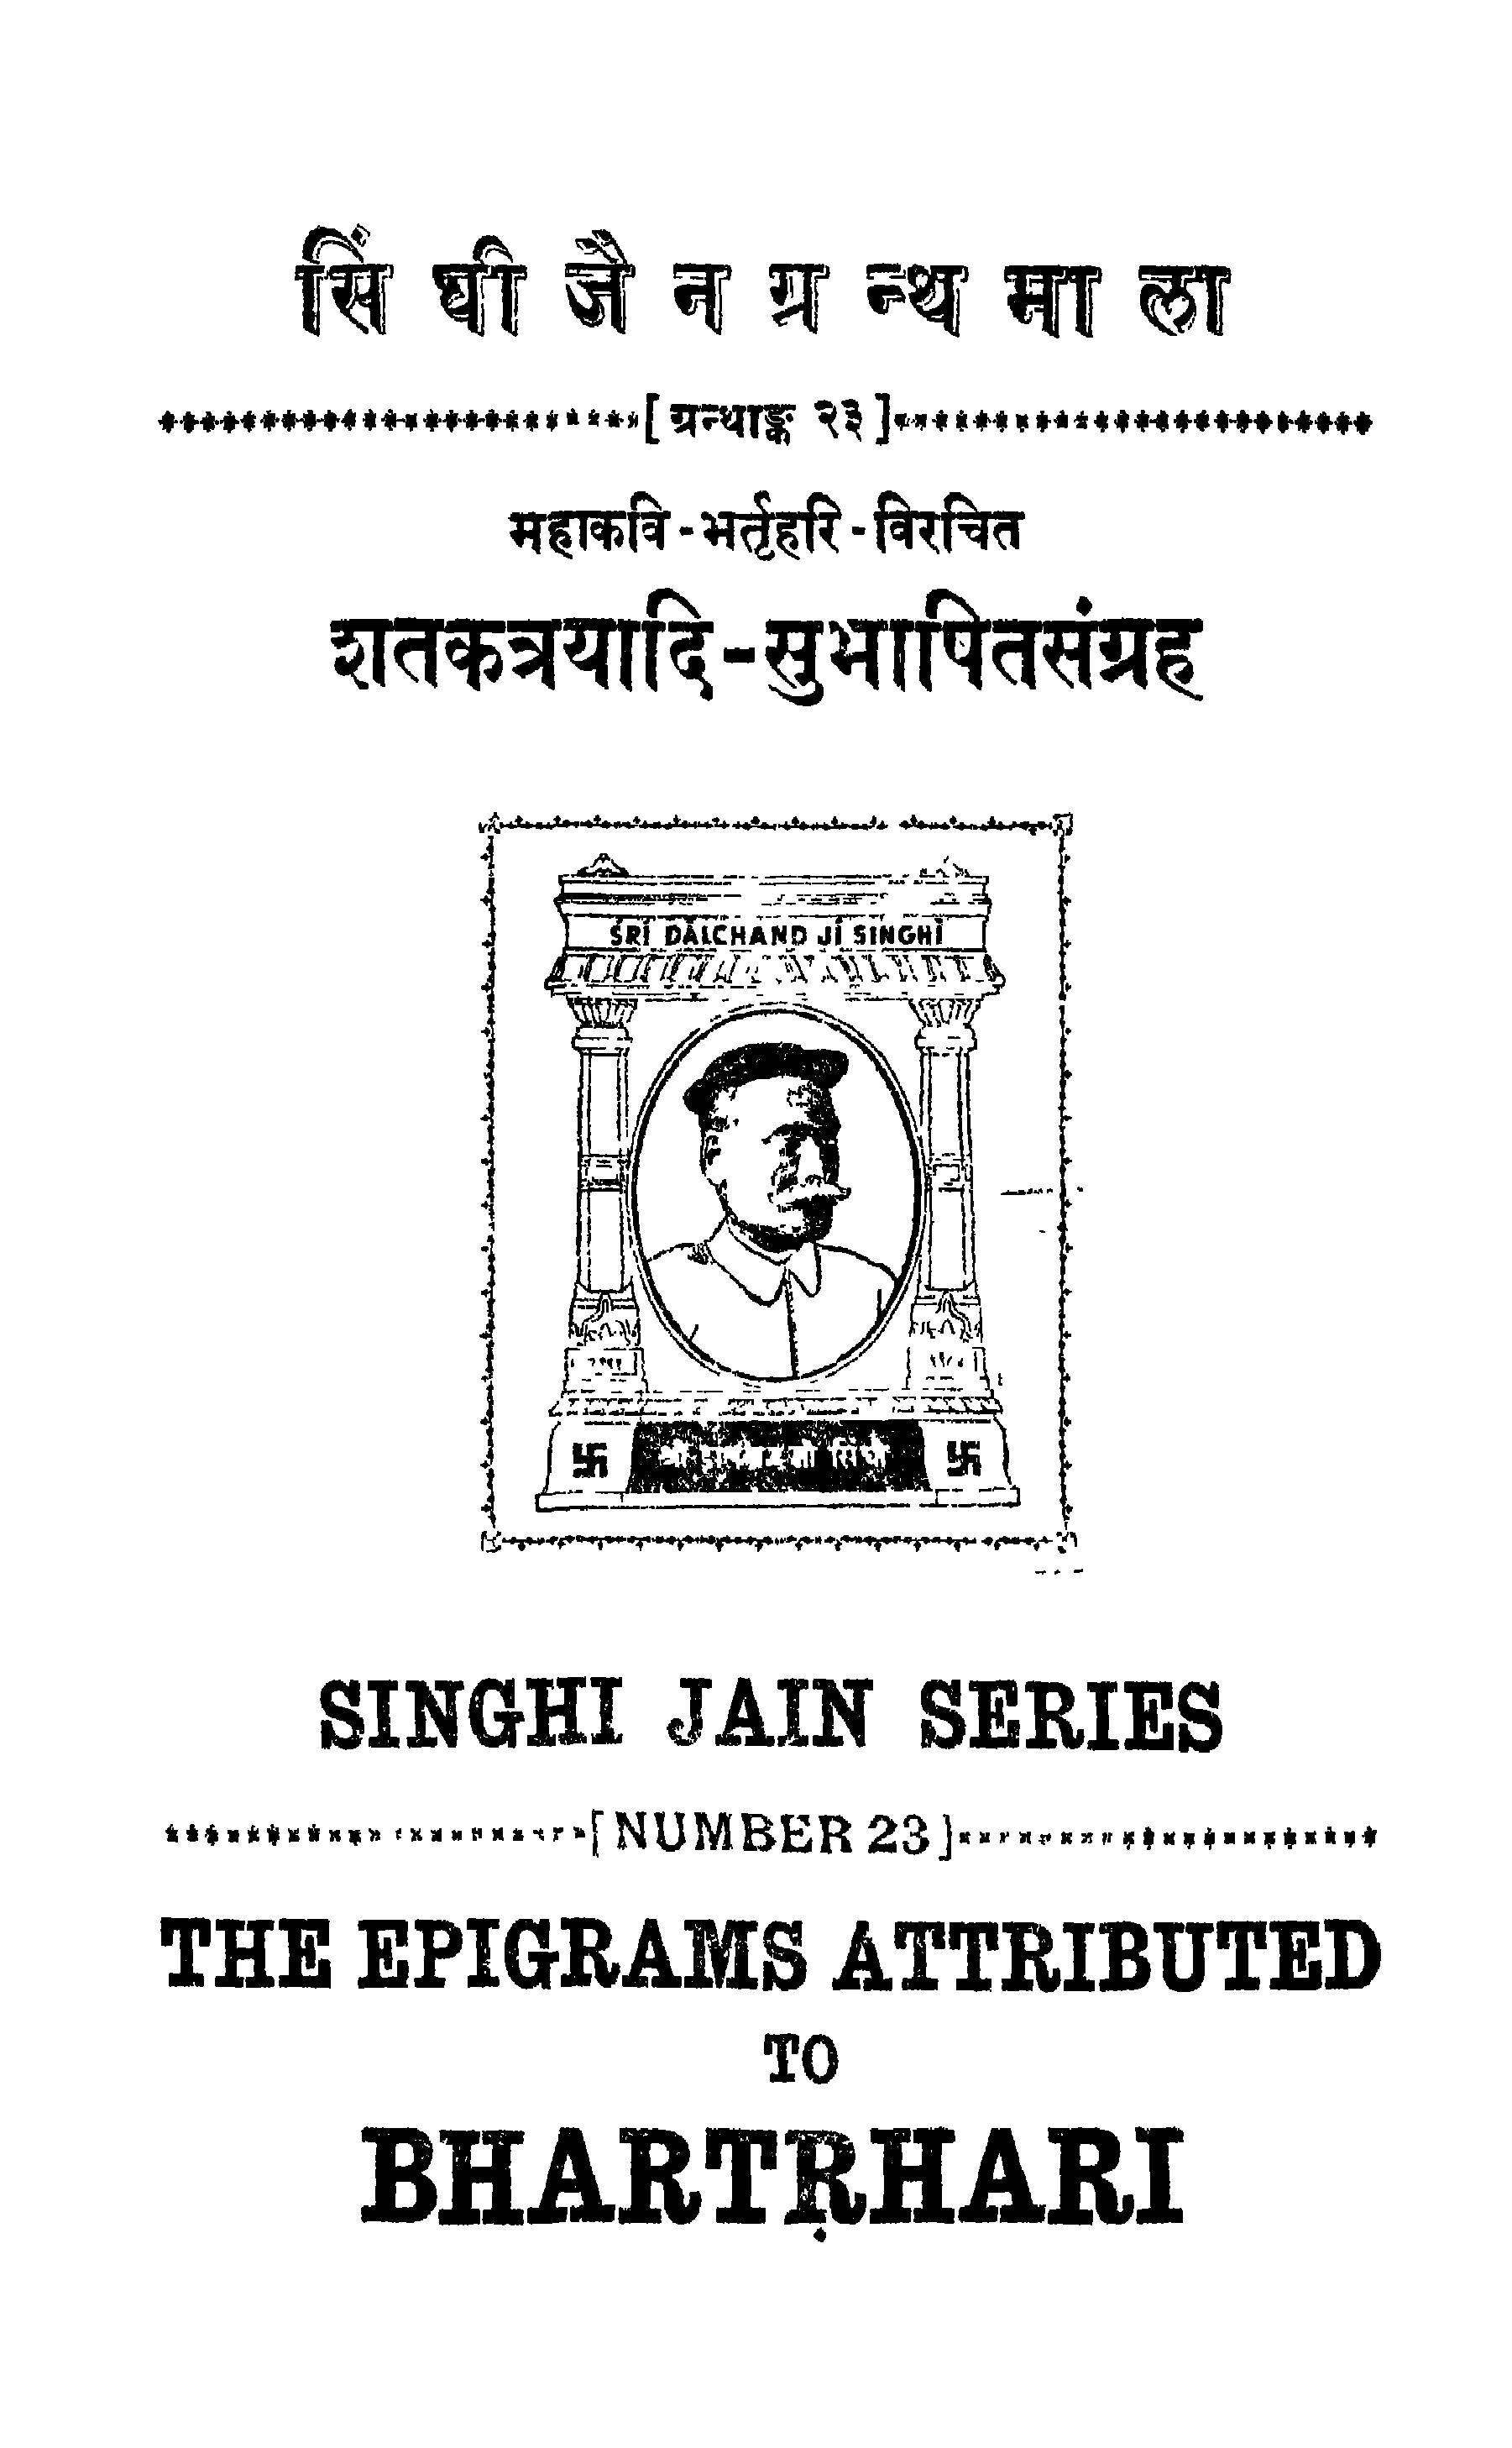 Bhrithari